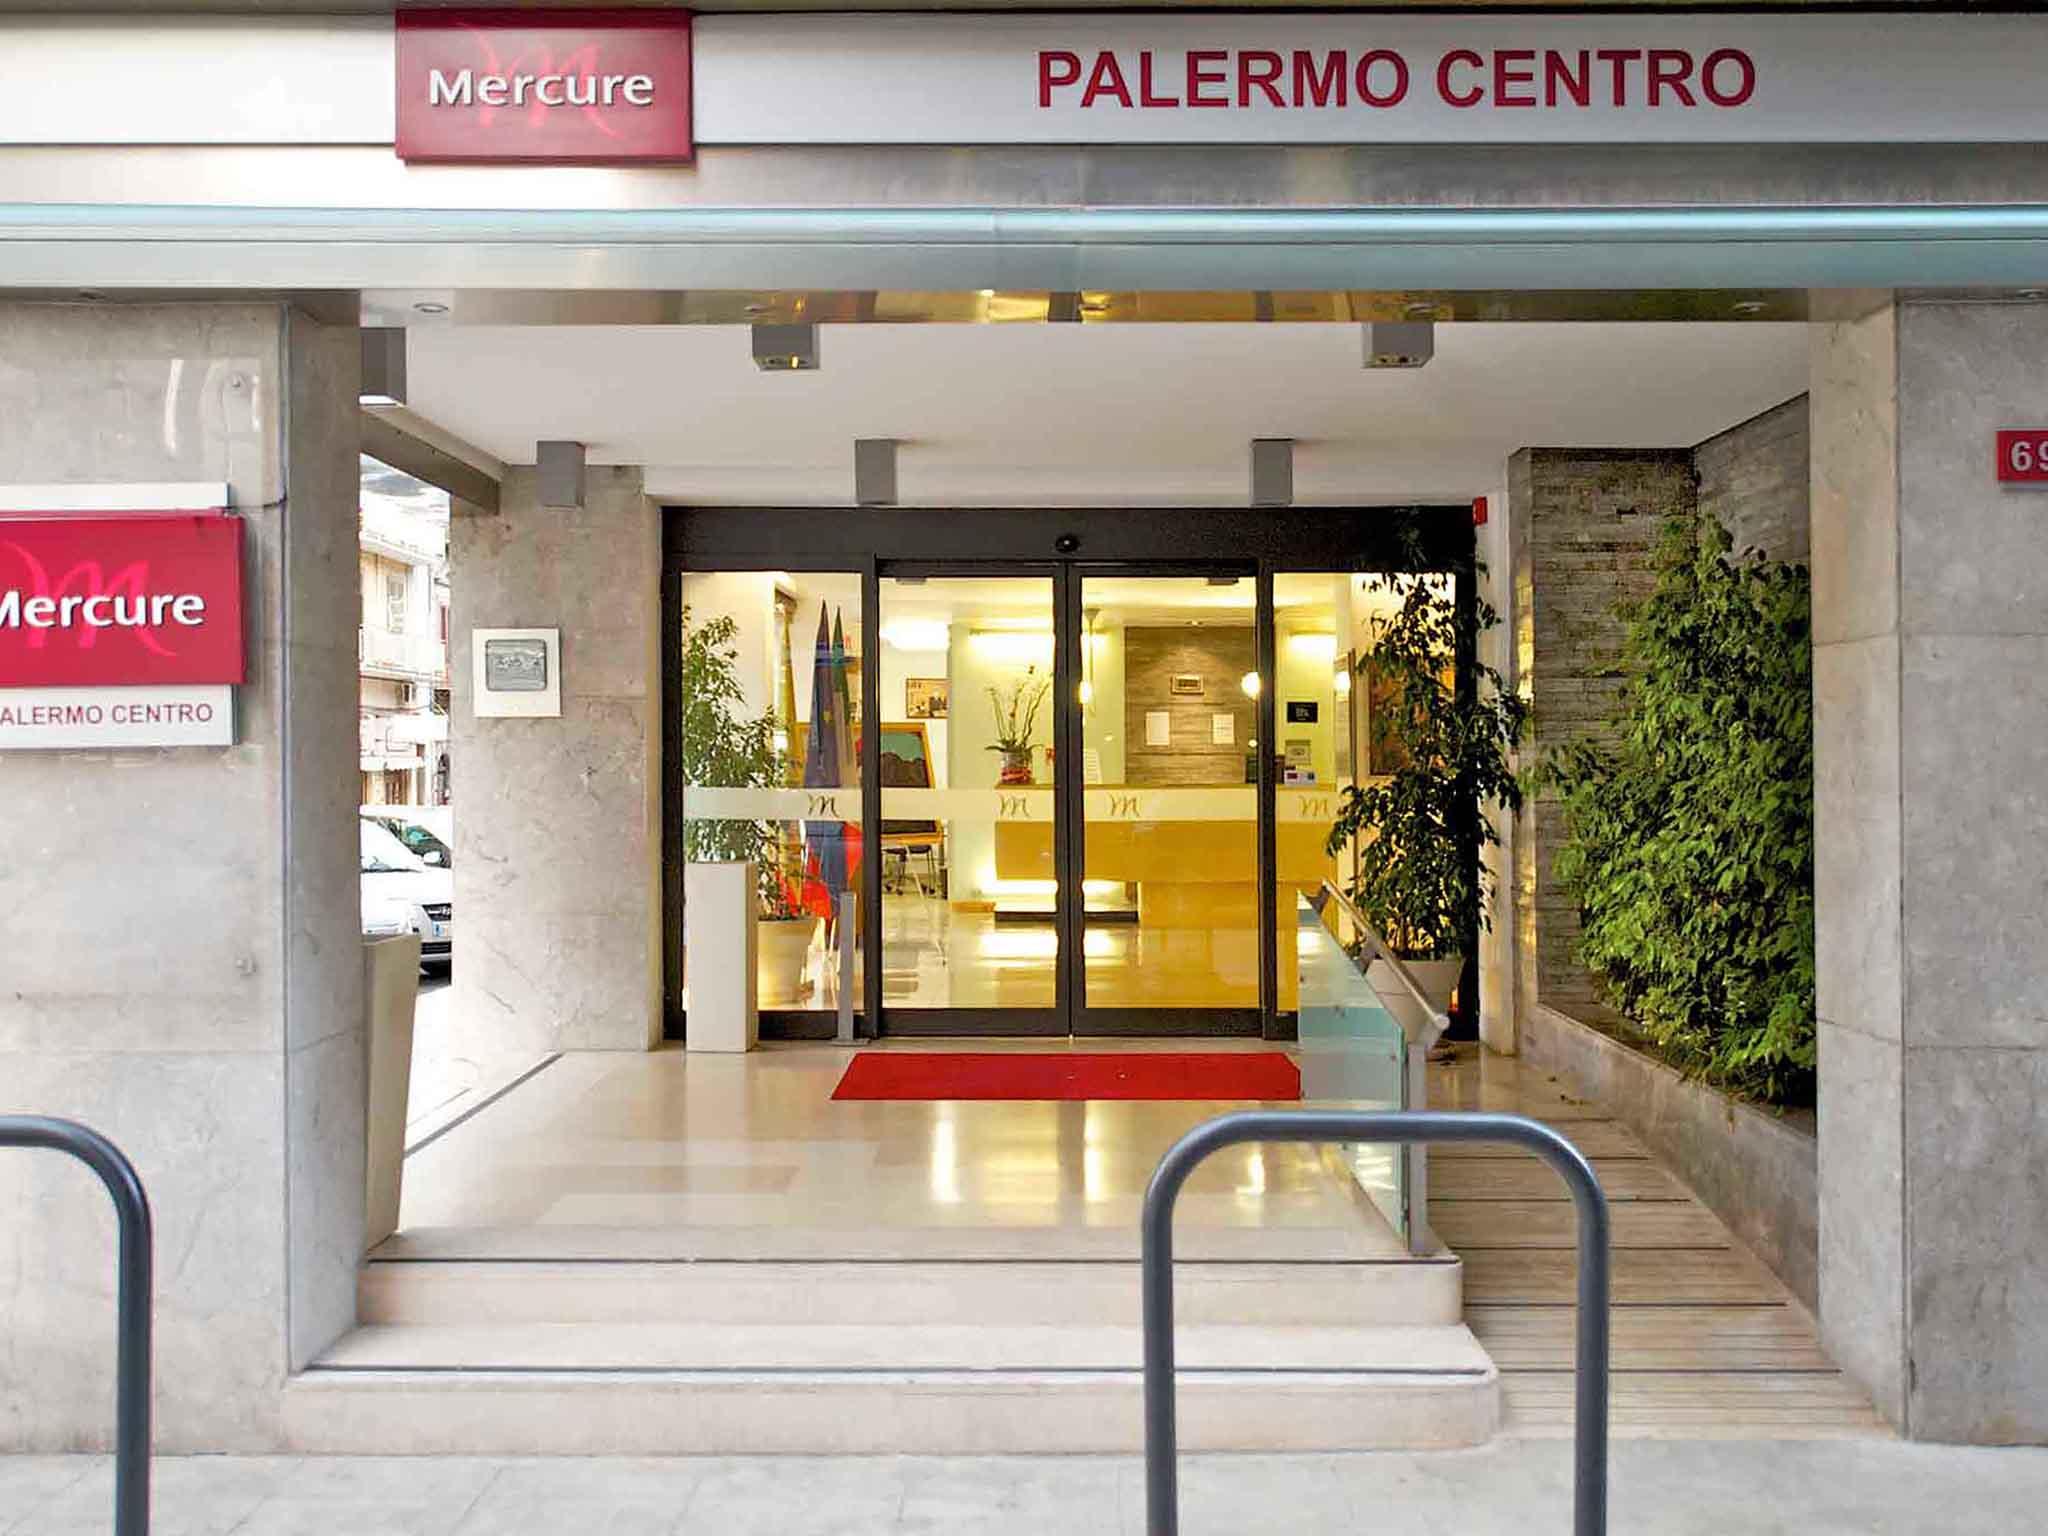 فندق - Mercure Palermo Centro